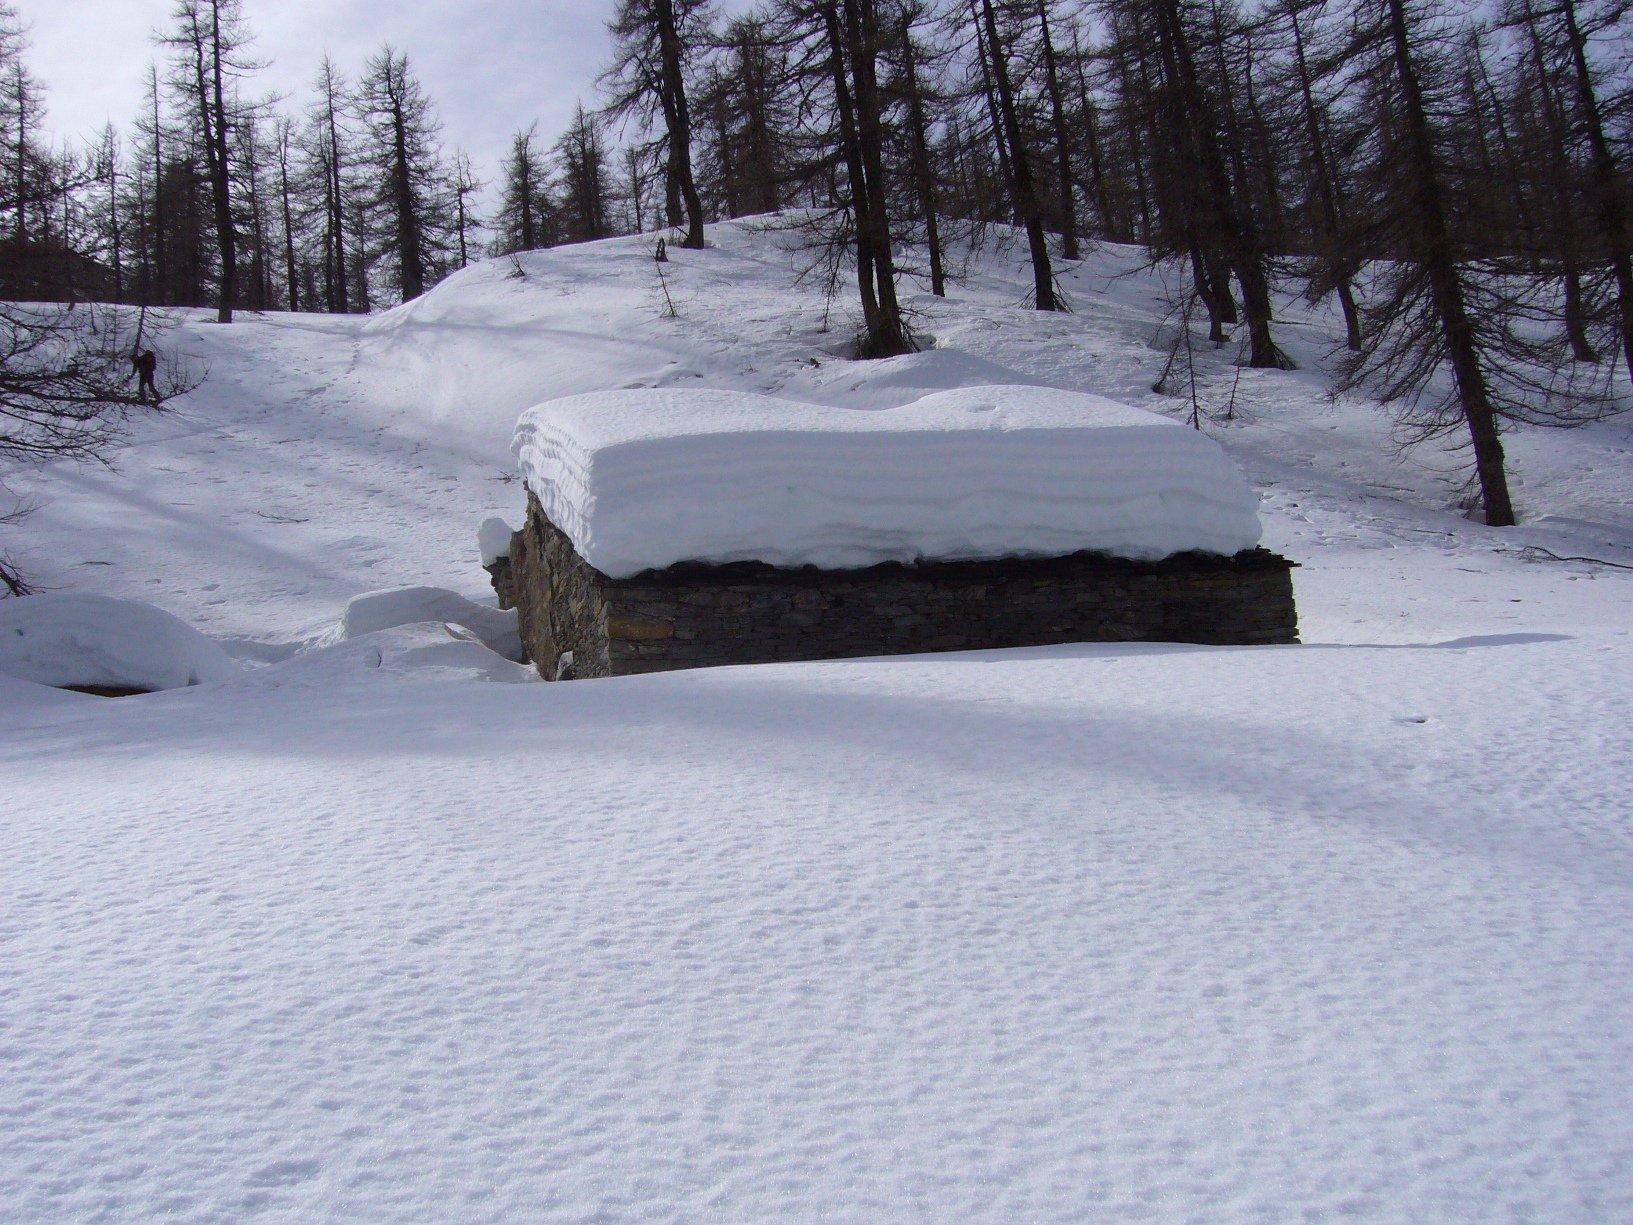 ancora tanta neve